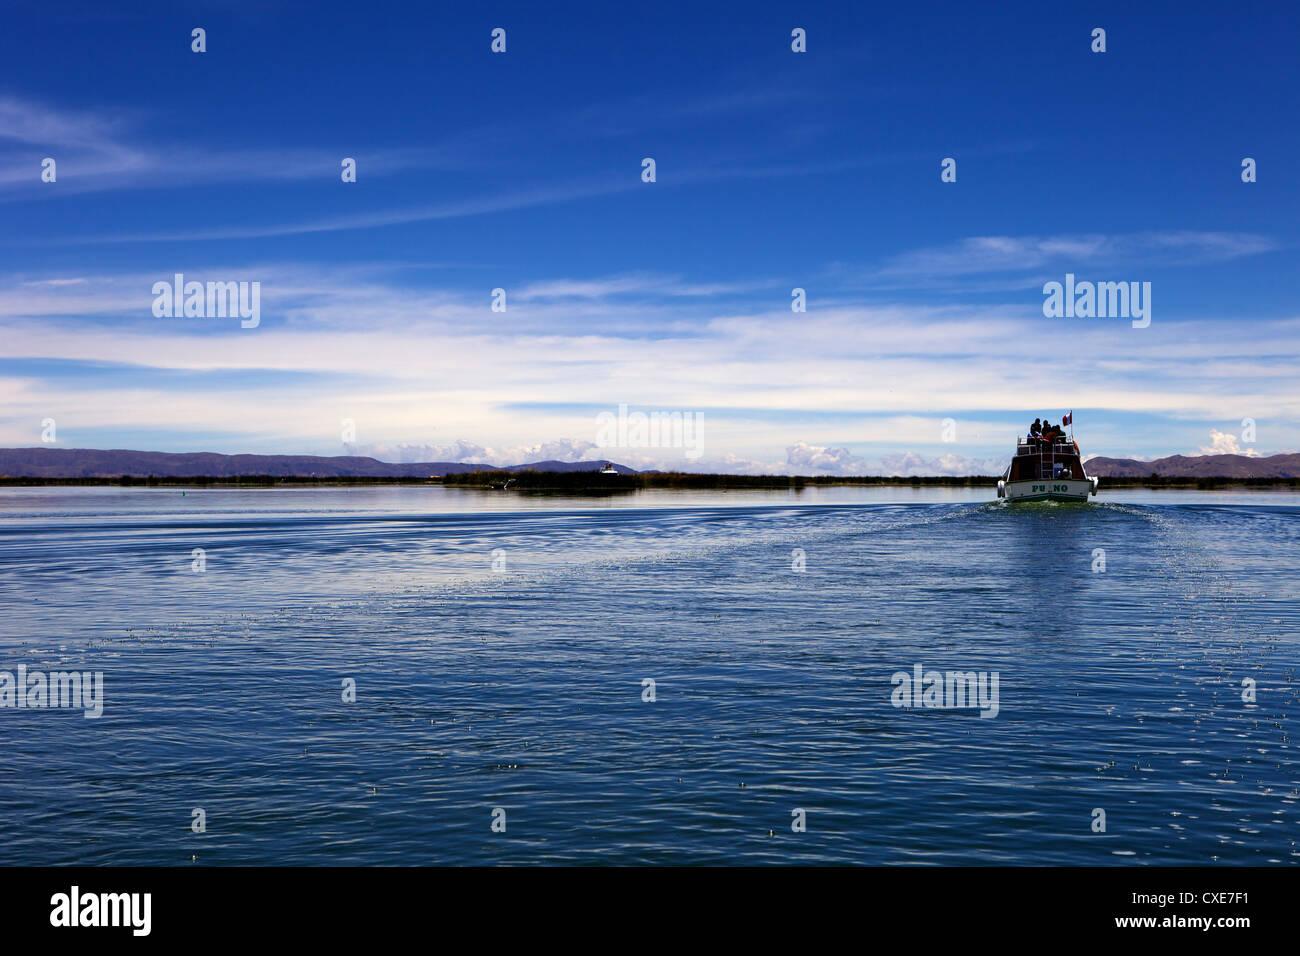 Boat on Lake Titicaca, peru, peruvian, south america, south american, latin america, latin american South America - Stock Image